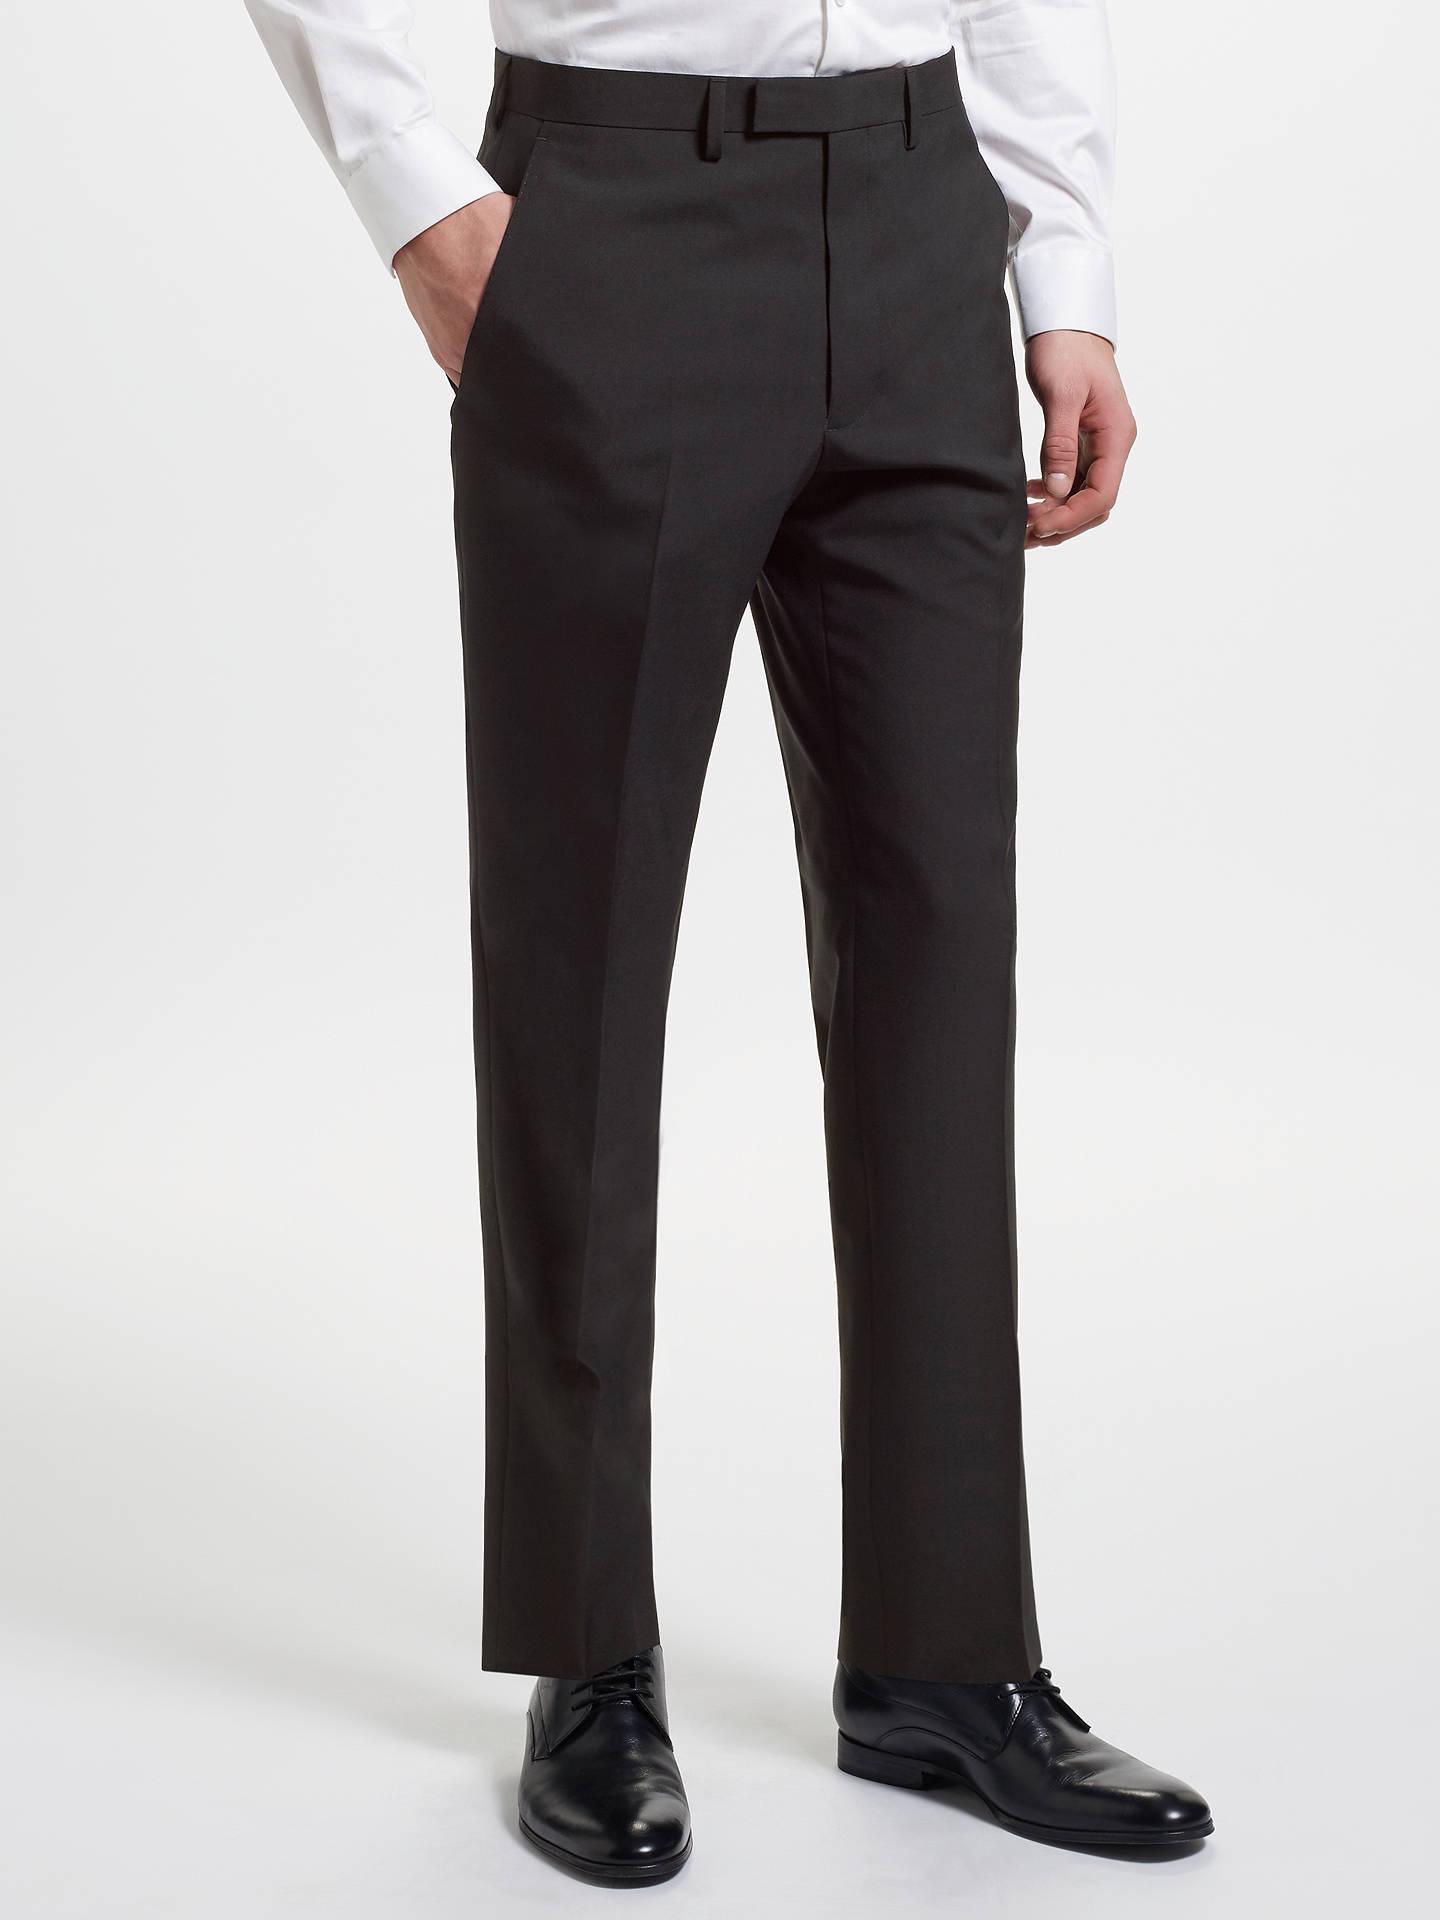 Kin Slim Fit Suit Trousers Black At John Lewis Amp Partners